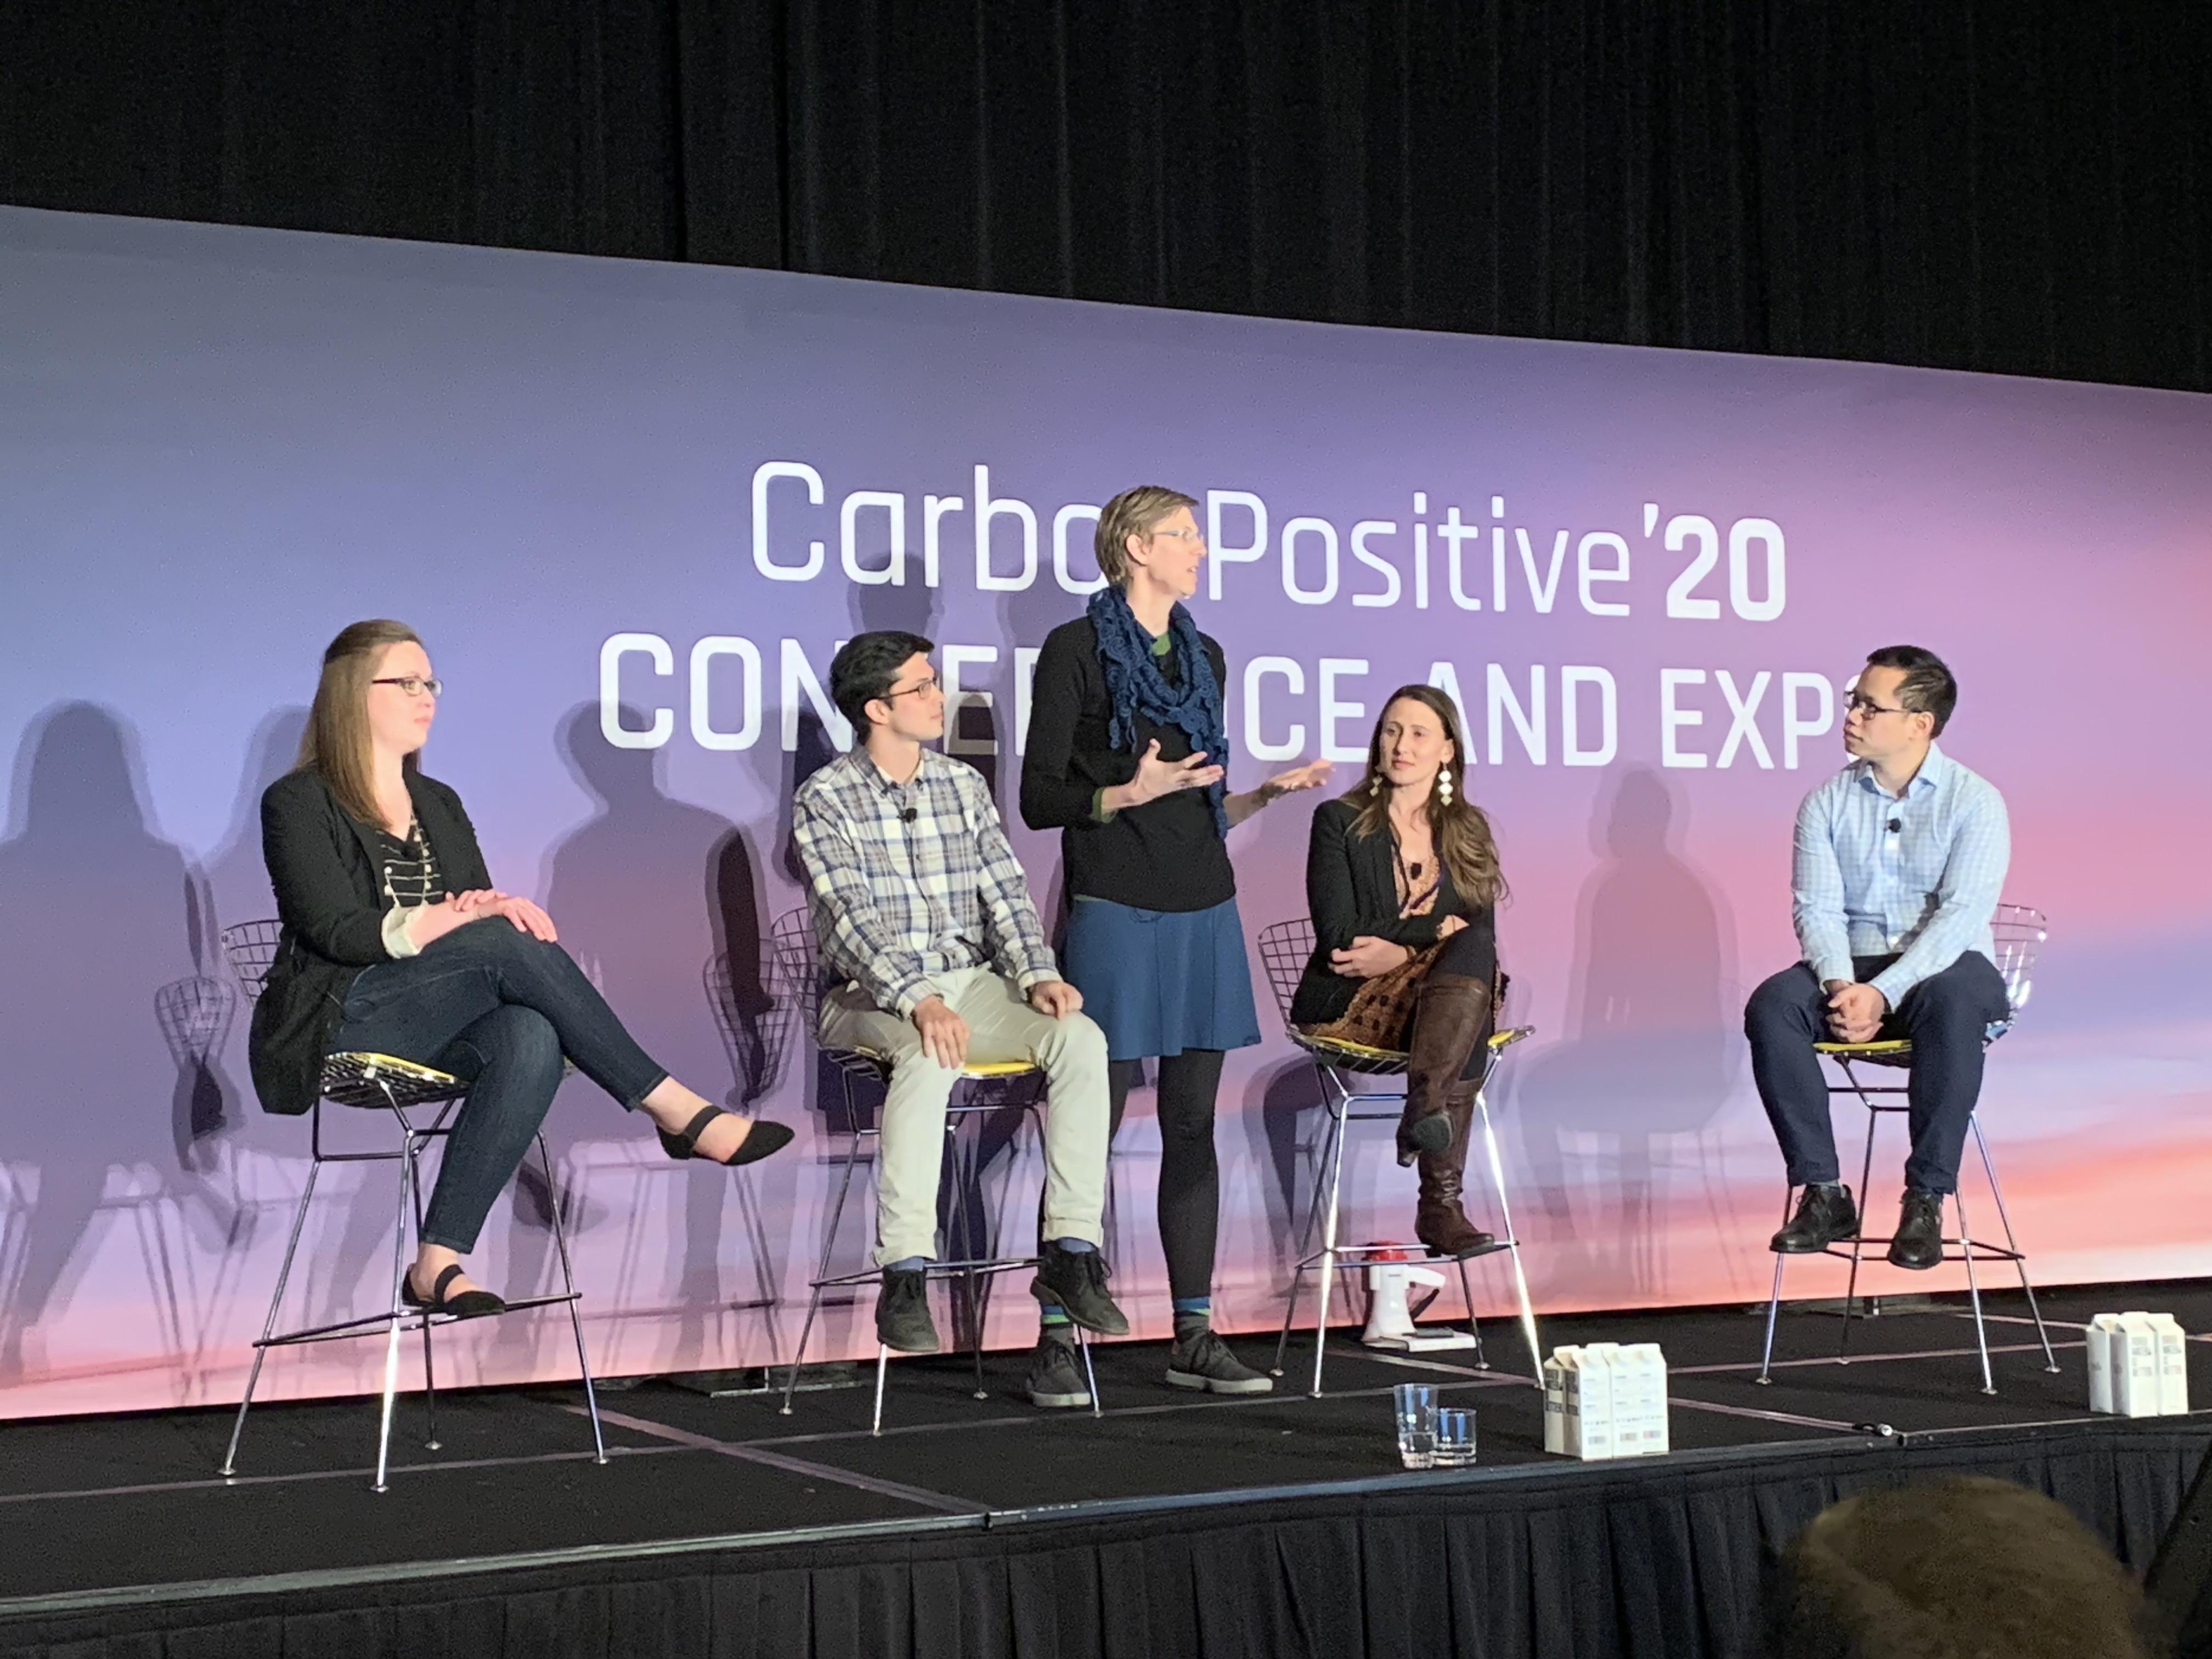 Jeremy Knoll attends CarbonPositive '20 Conference